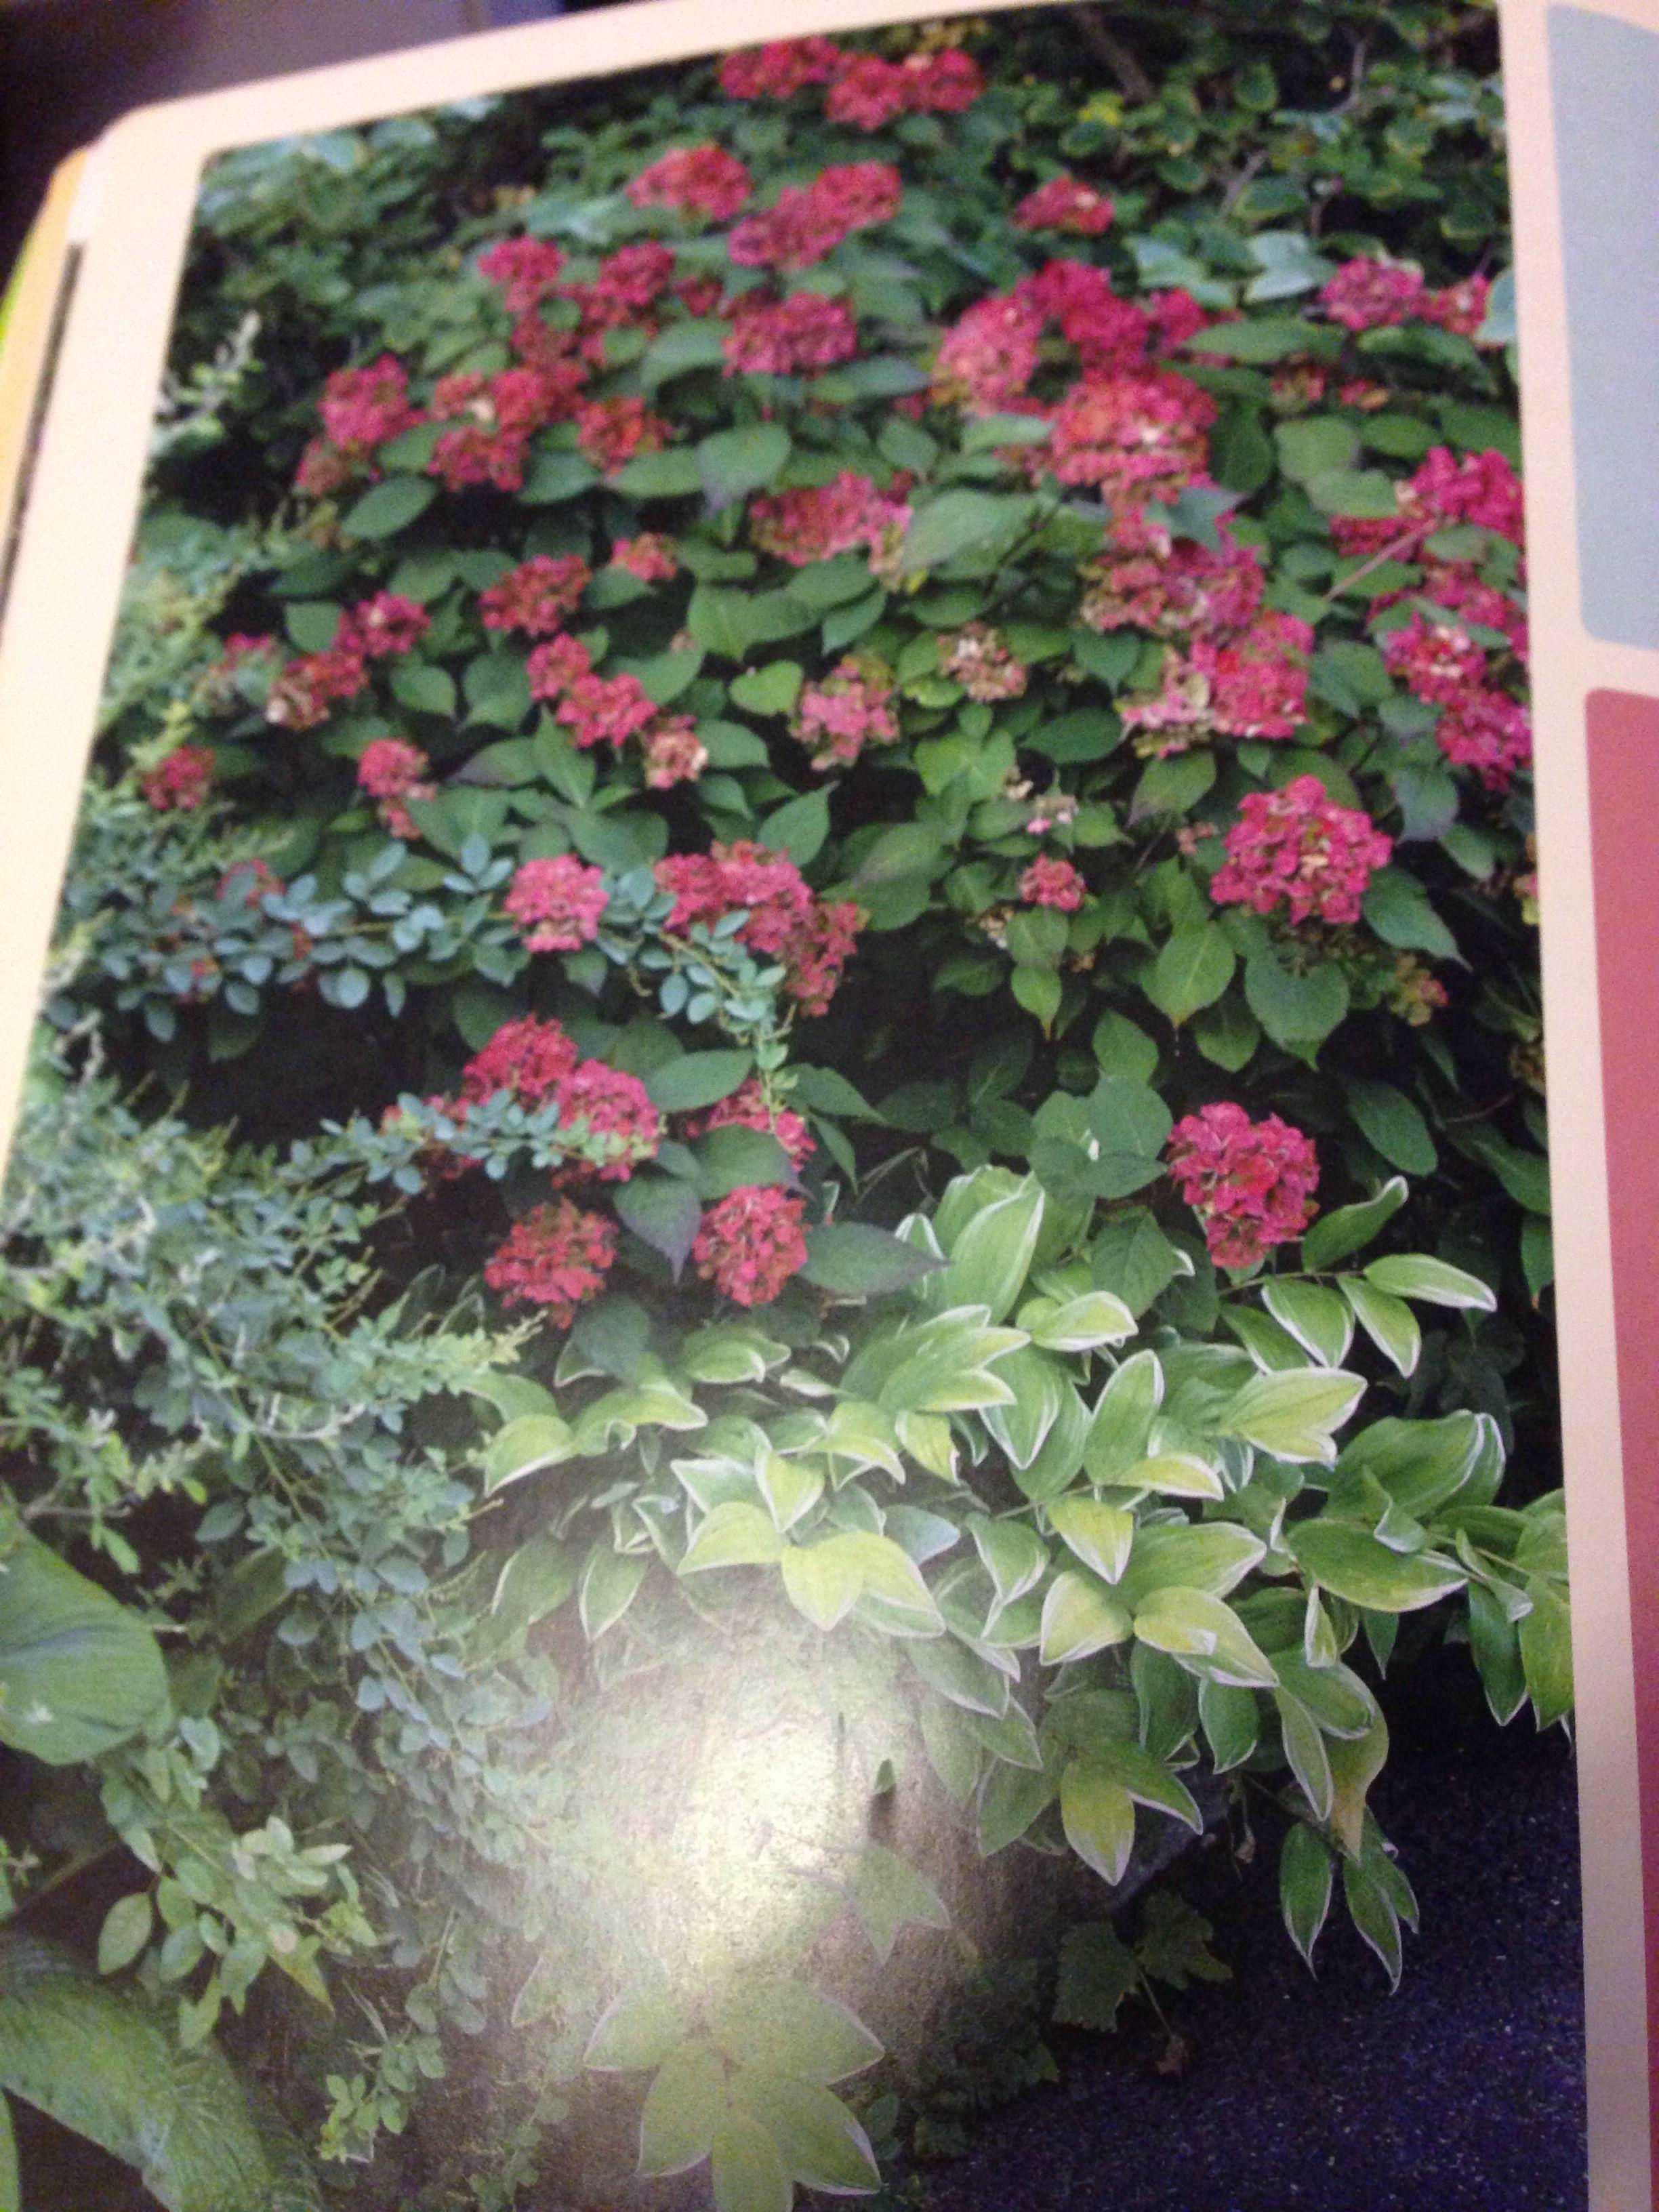 Hydrangea preziosa and polygons yum odaratum Variegatum. Next to azaleas in back yard